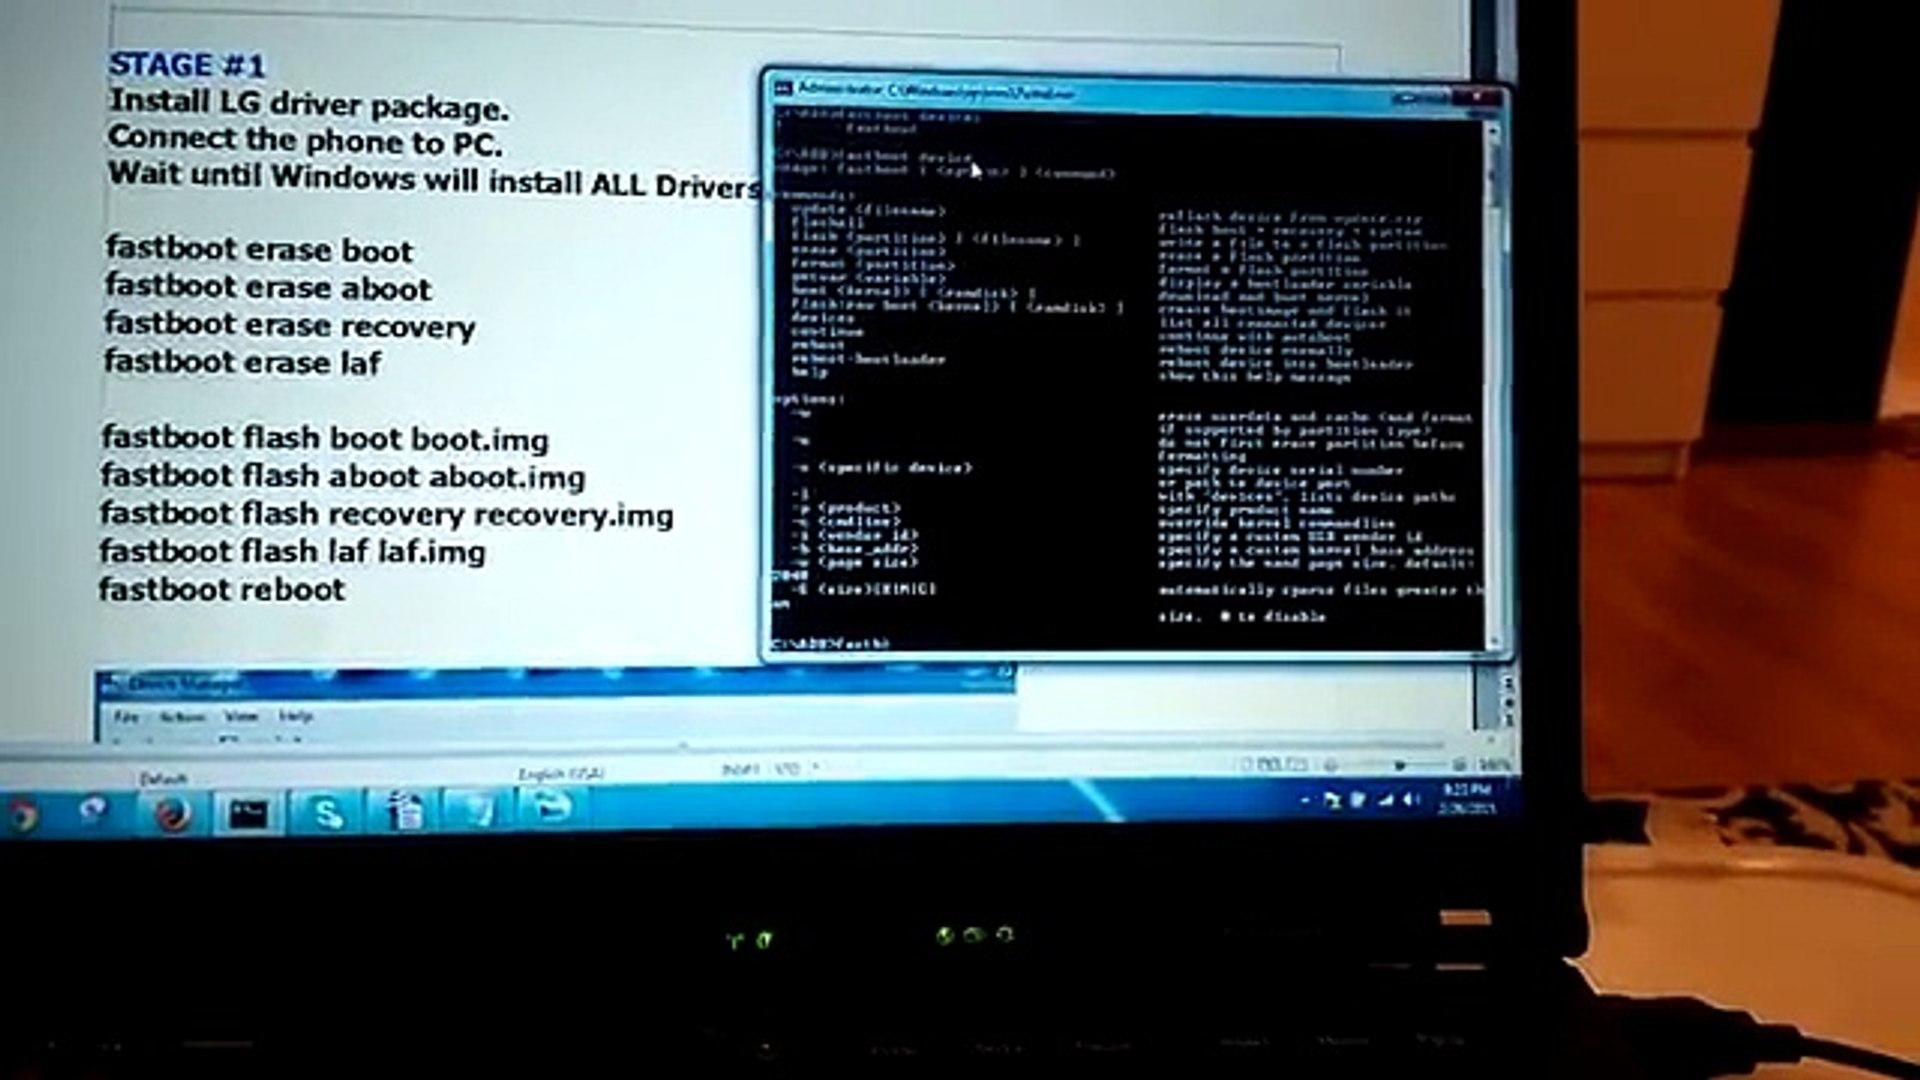 FIX DEAD LG G2 - Unbrick - Fix Fastboot Mode - EASY METHOD